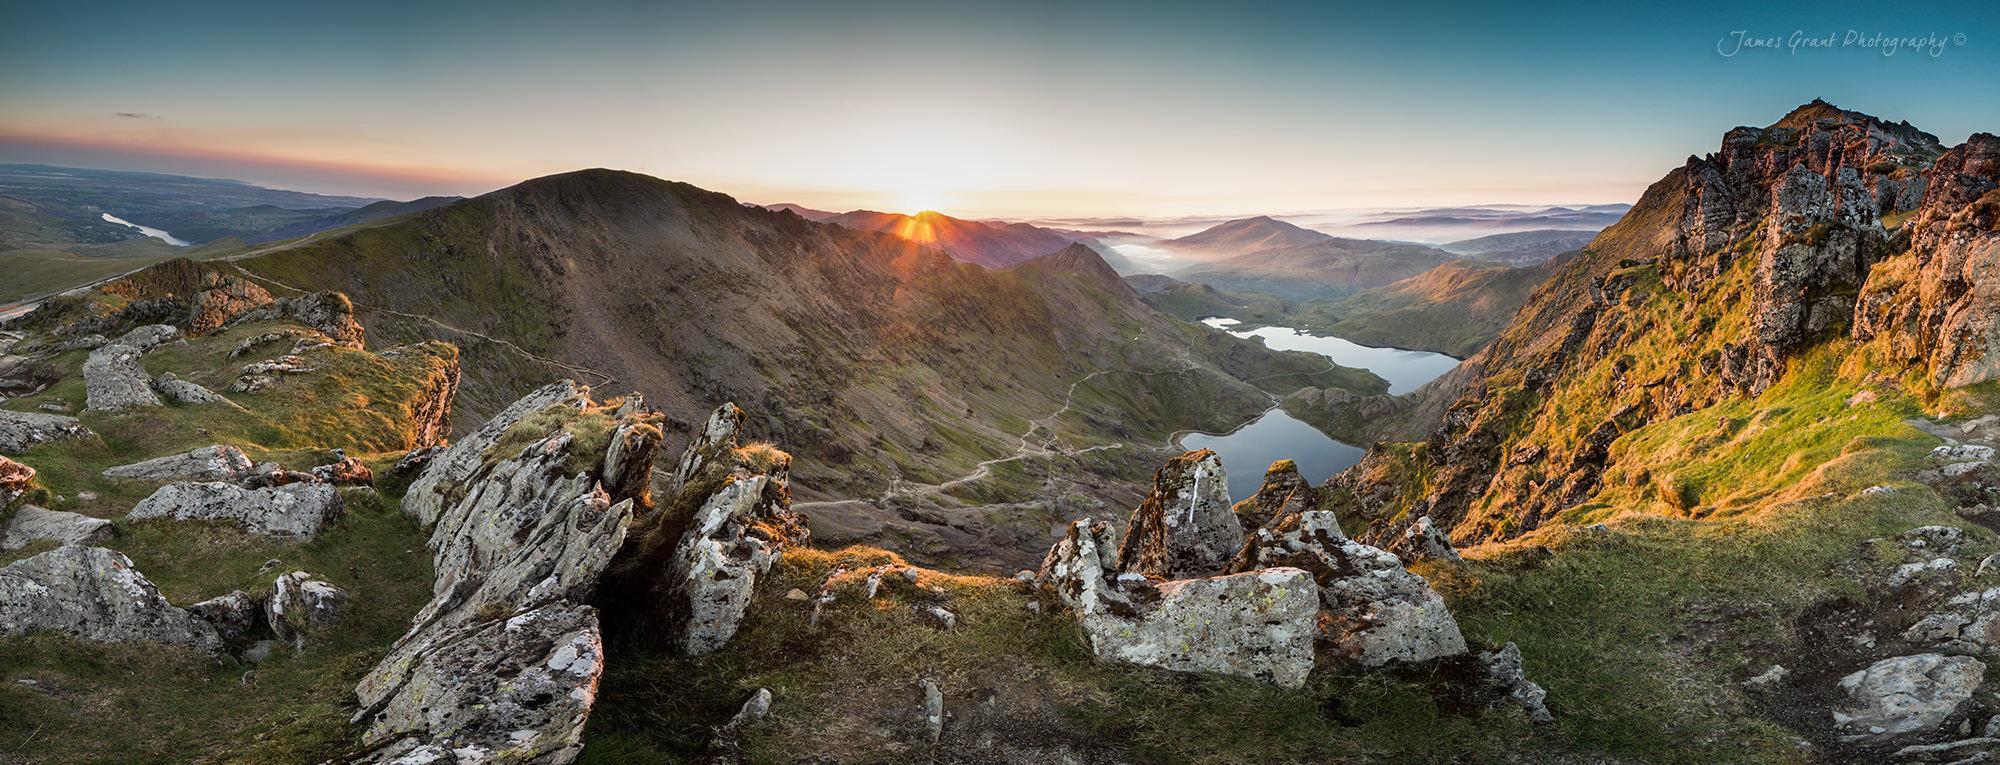 Snowdon Sunrise Panoramic - Snowdonia Photography